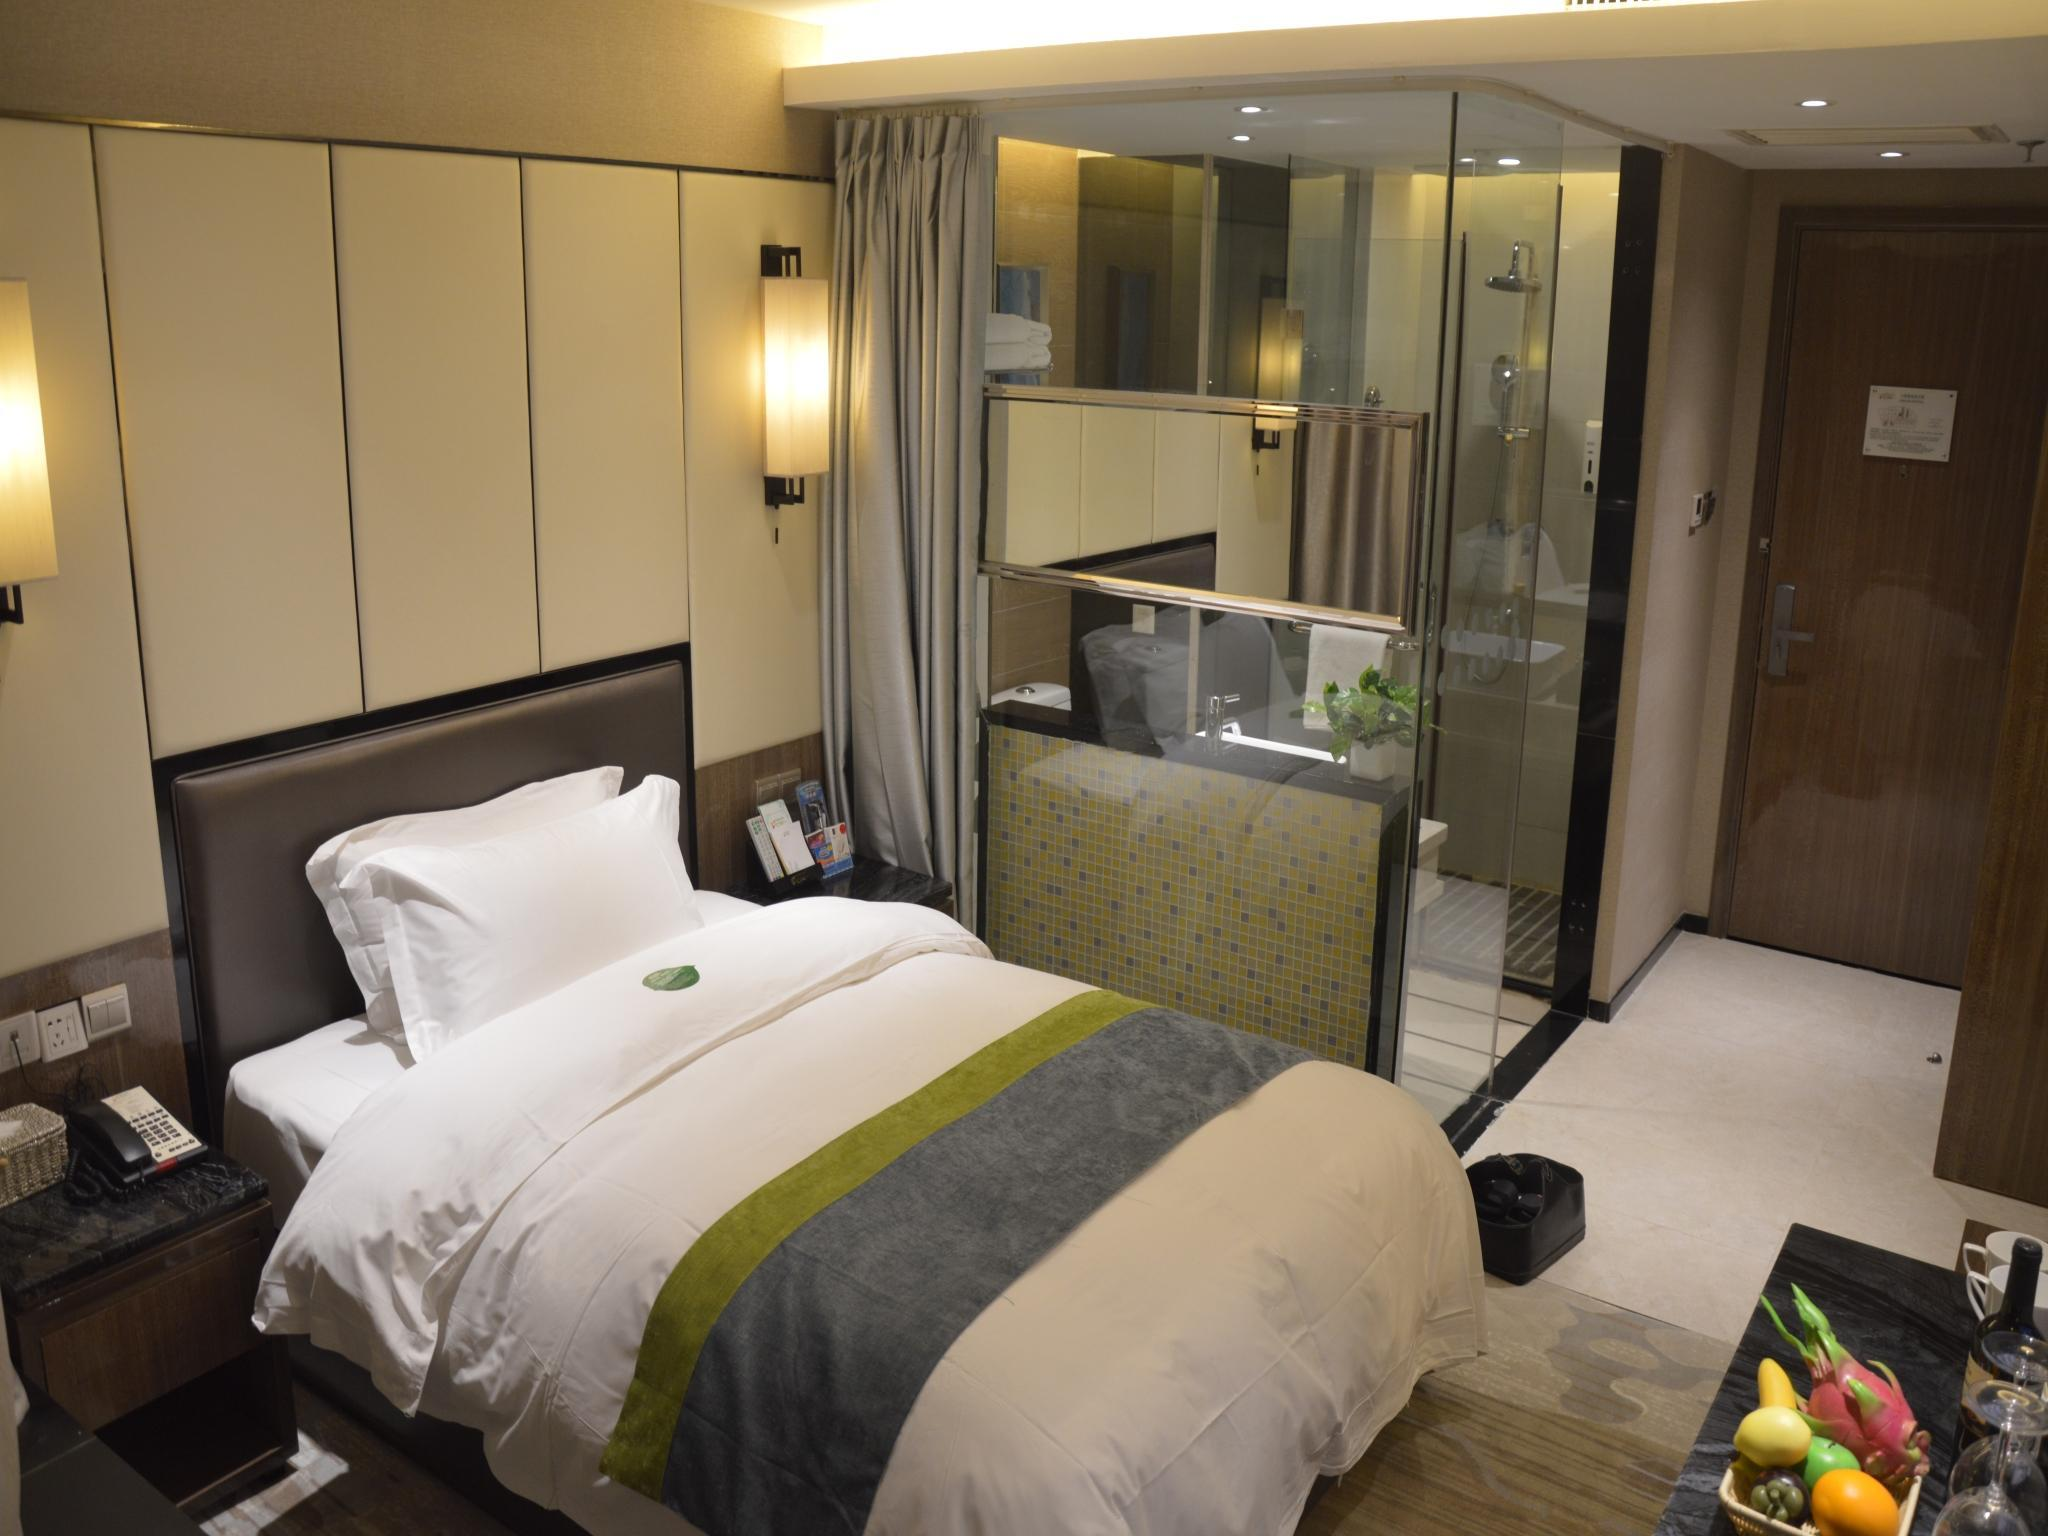 Nanning Champs Elysees Hotel Nanning China